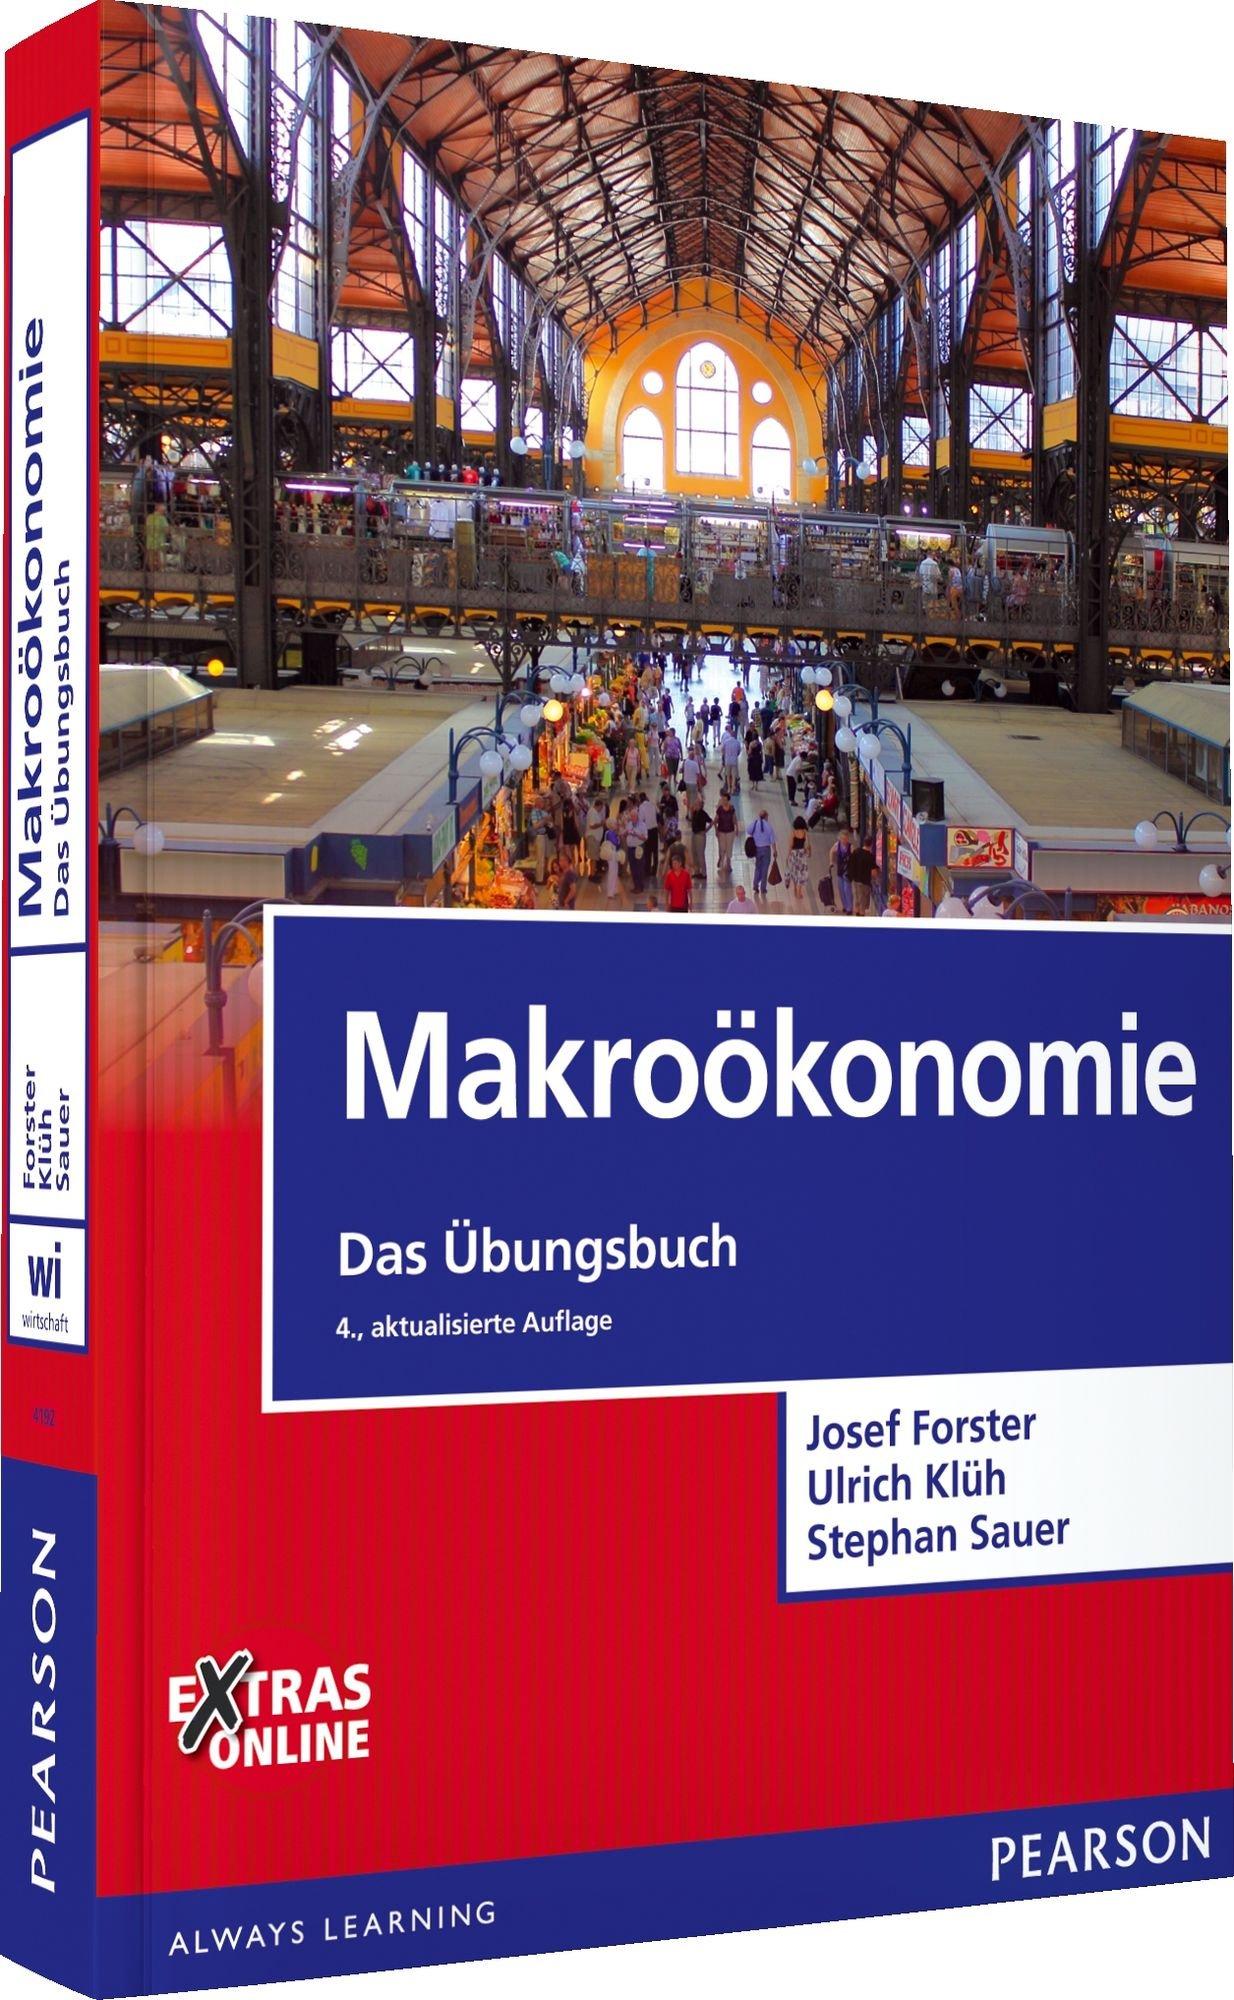 Makroökonomie - Das Übungsbuch (Pearson Studium - Economic VWL ...